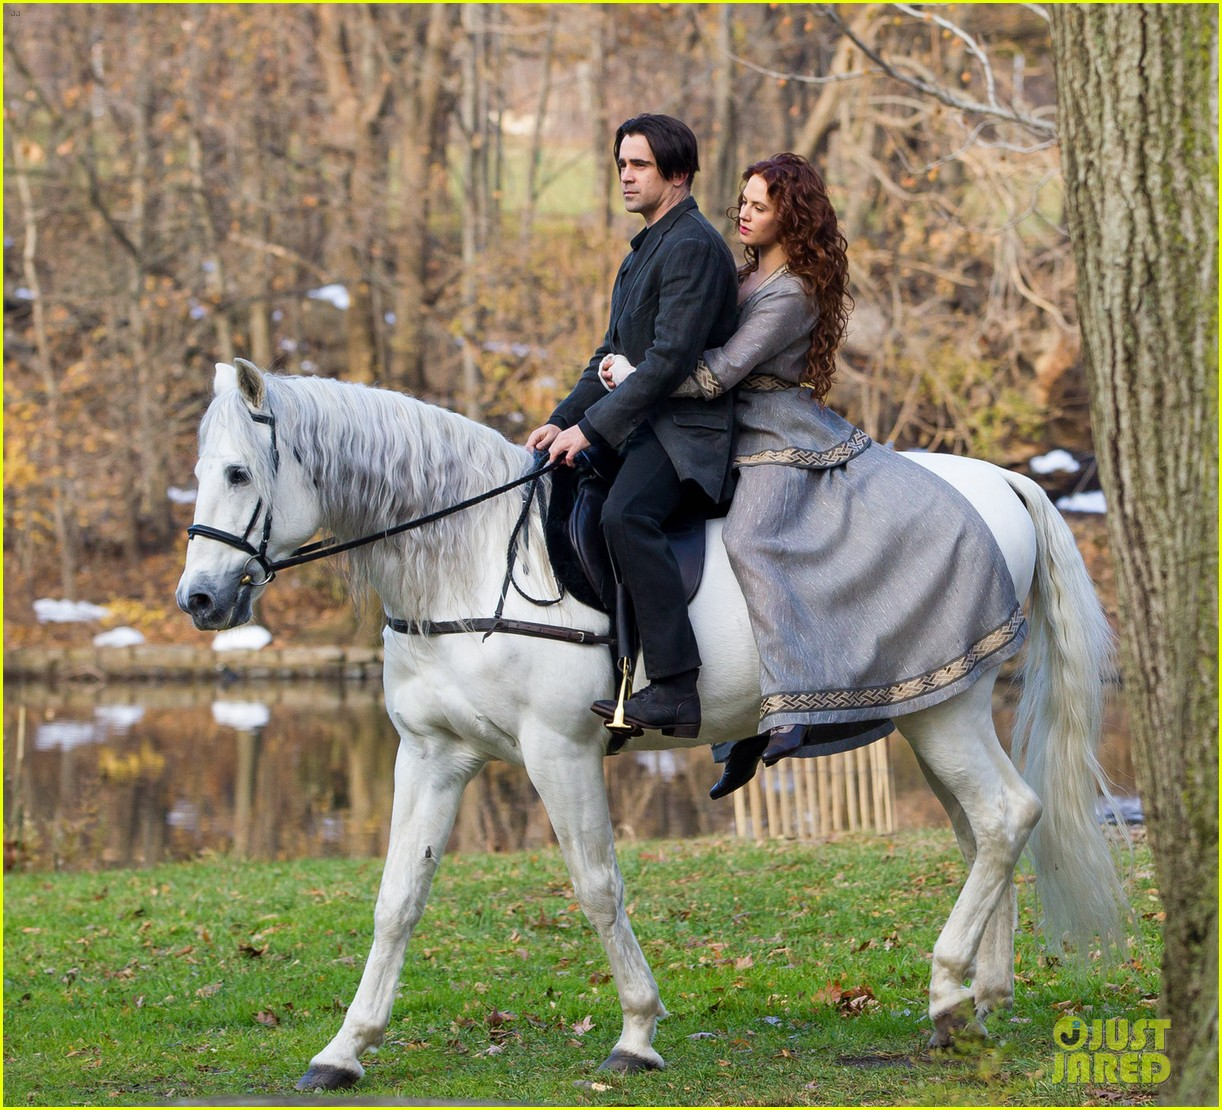 http://4.bp.blogspot.com/-rDxrlWJY-TU/URJ-VSdhjkI/AAAAAAAAEPY/u3ZCXz8LHHM/s1600/colin-farrell-jessica-brown-findlay-horseback-riding-winters-tale-02.jpg